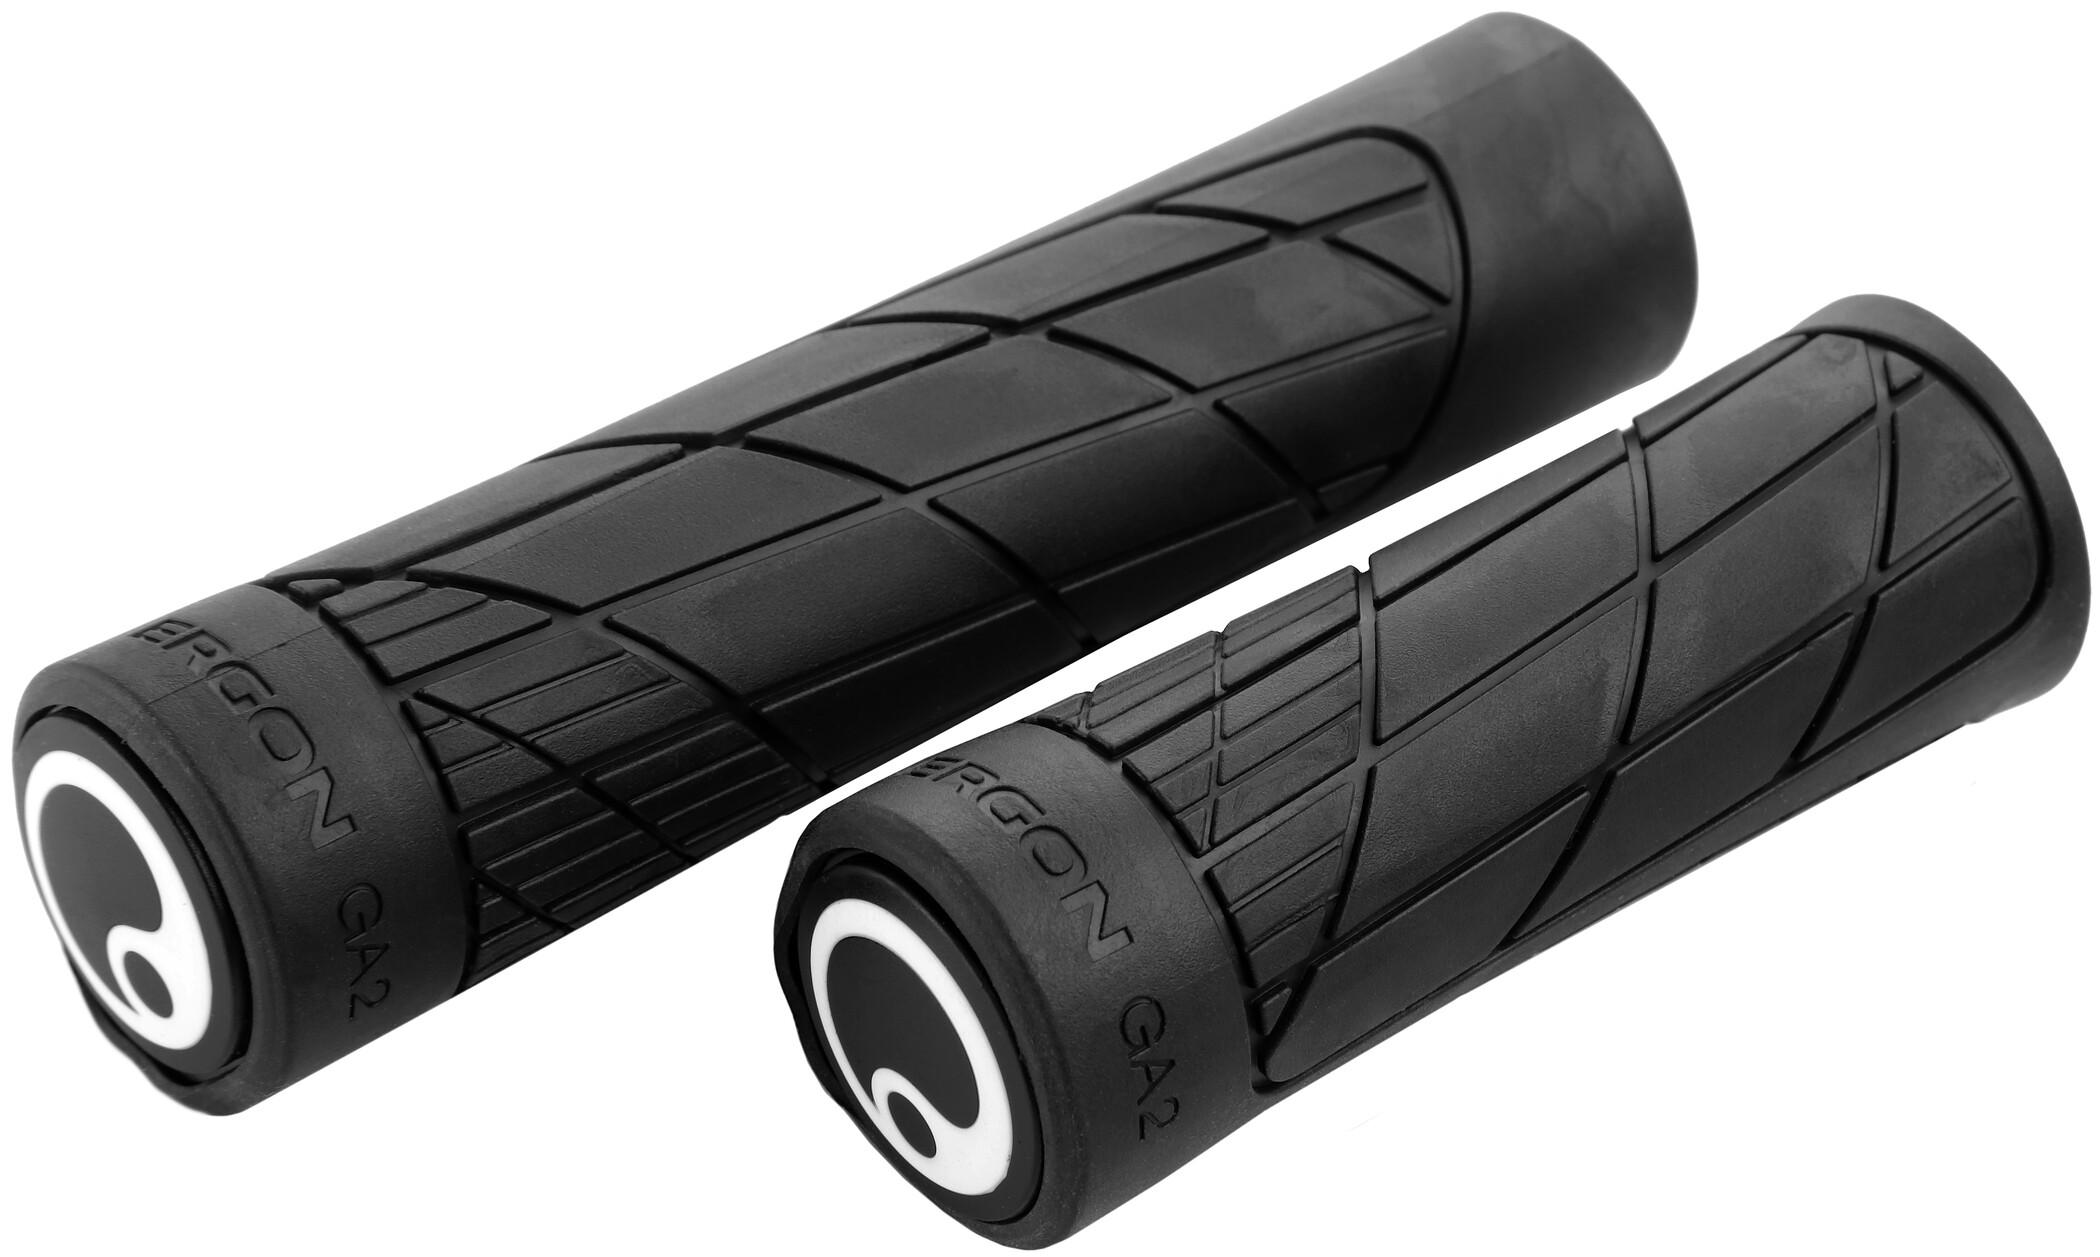 Ergon GA2 Single Twist Shift Cykelhåndtag, black | Håndtag